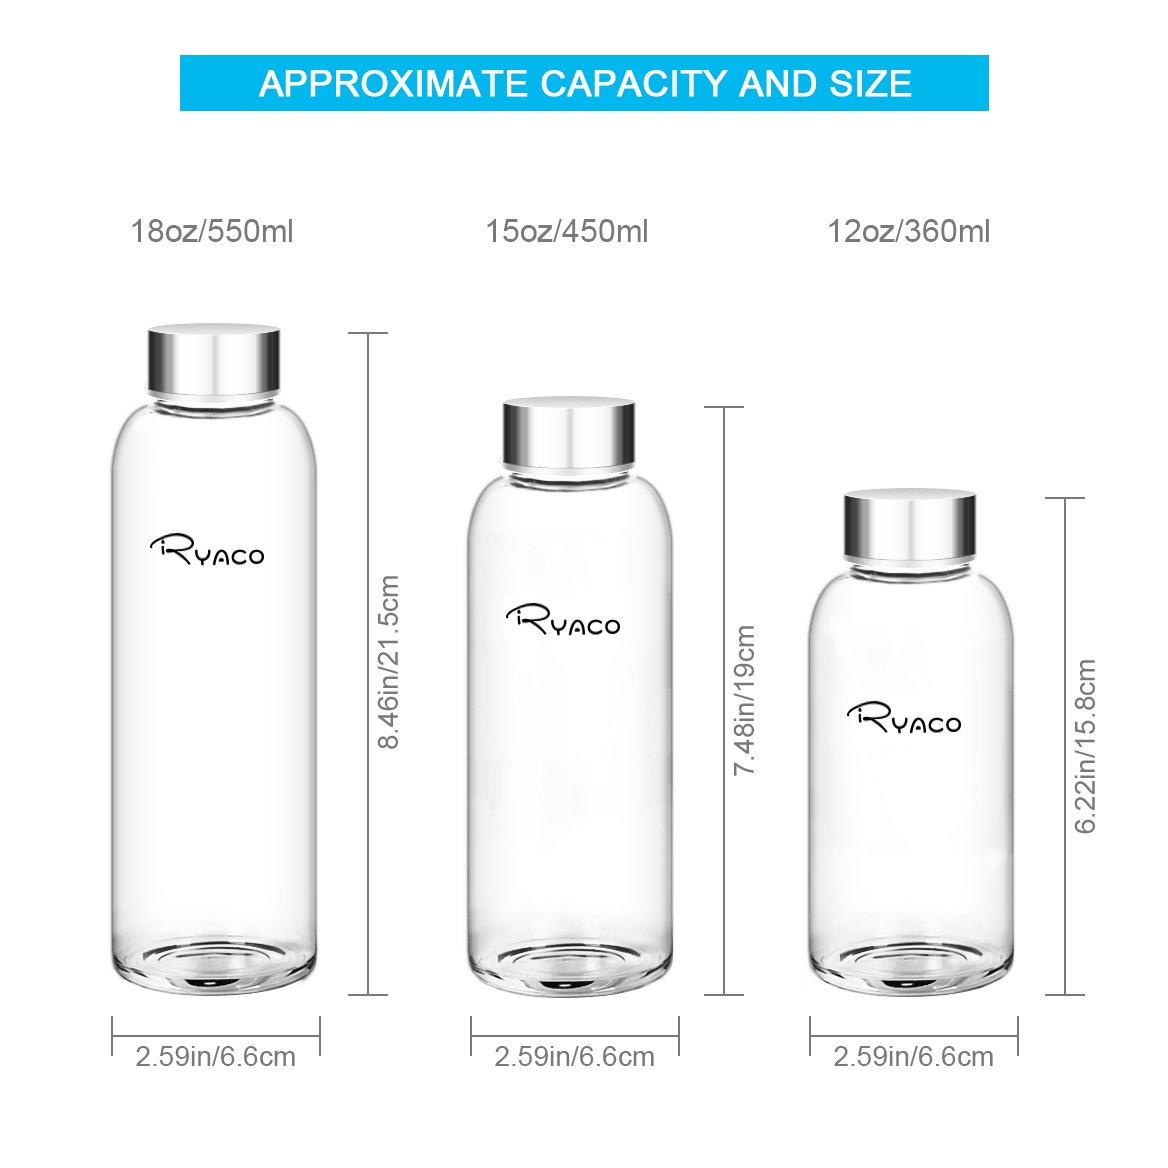 Ryaco Botella de Agua Cristal 360ml, Botella de Agua Reutilizable 12 oz, Sin BPA Antideslizante Protección Neopreno Llevar Manga con Acero Inoxidable Tapas ...